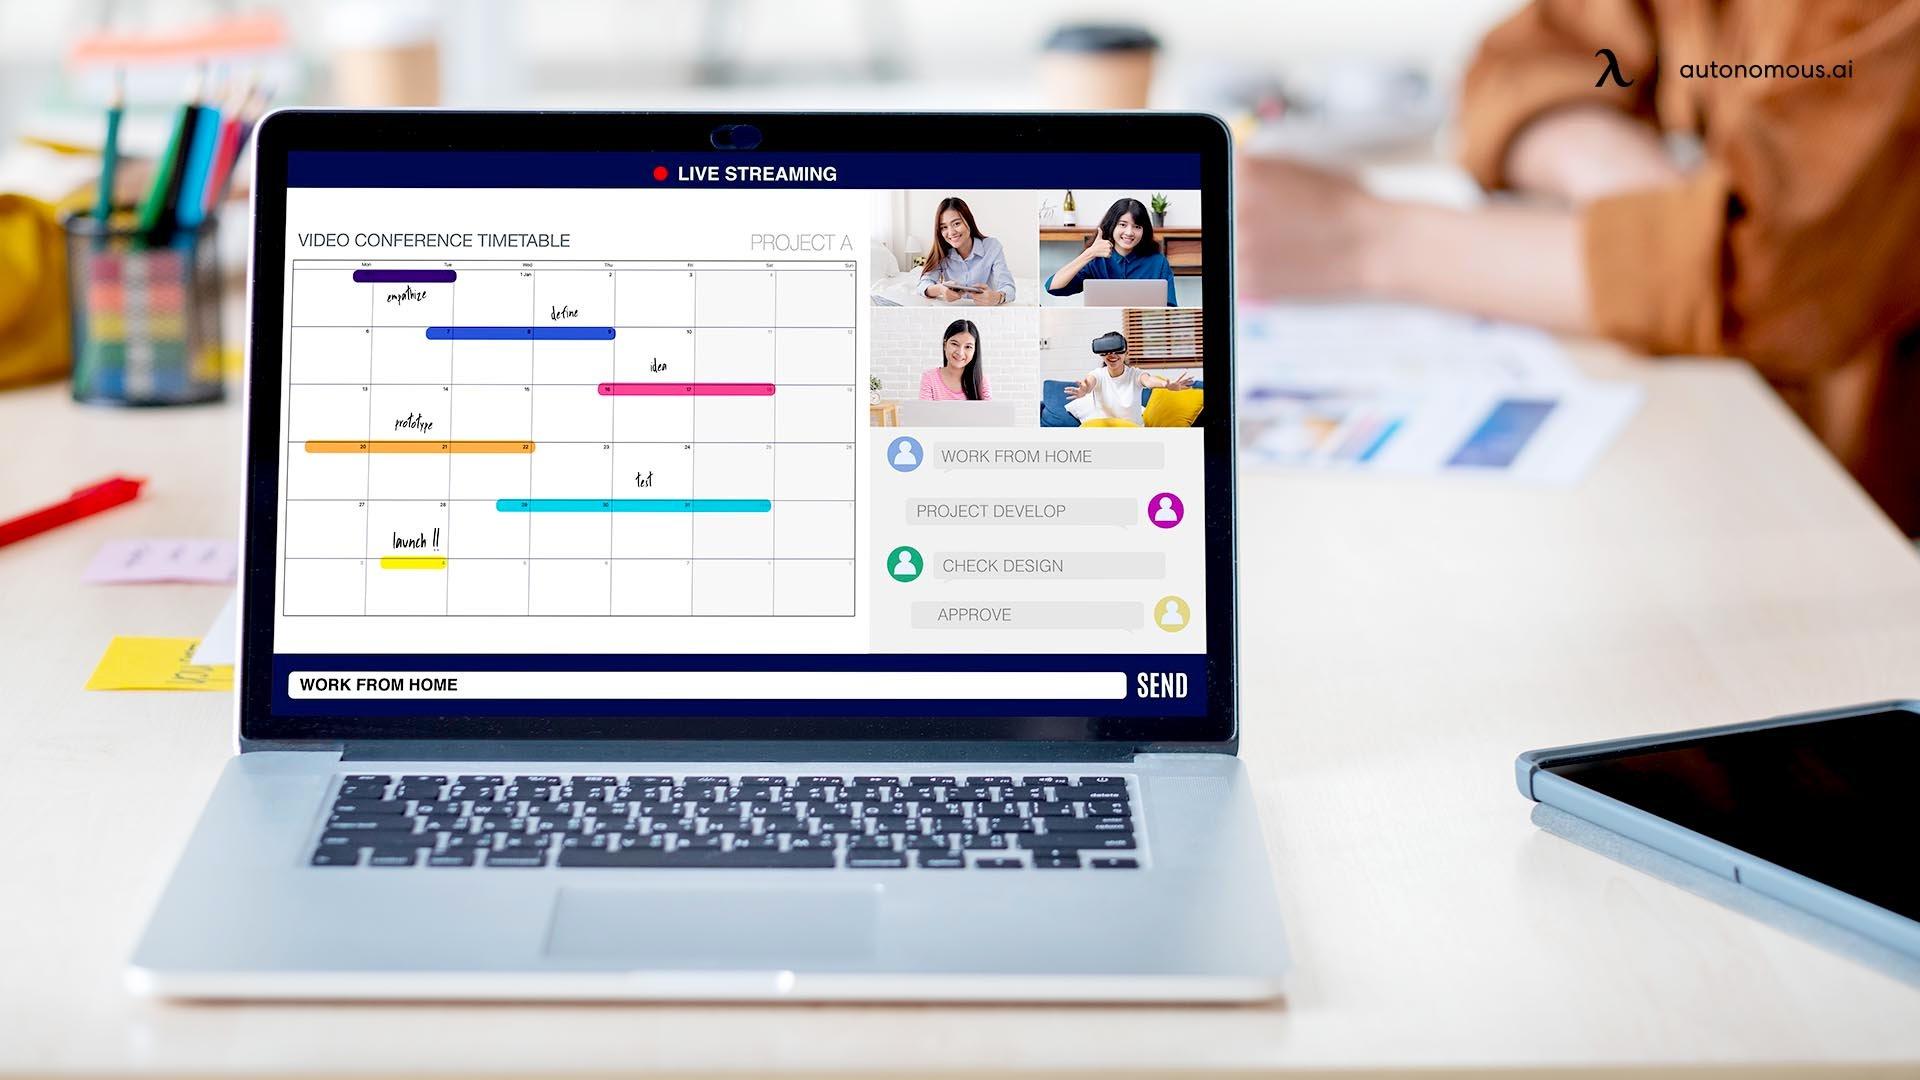 3.2 Employees set their schedules